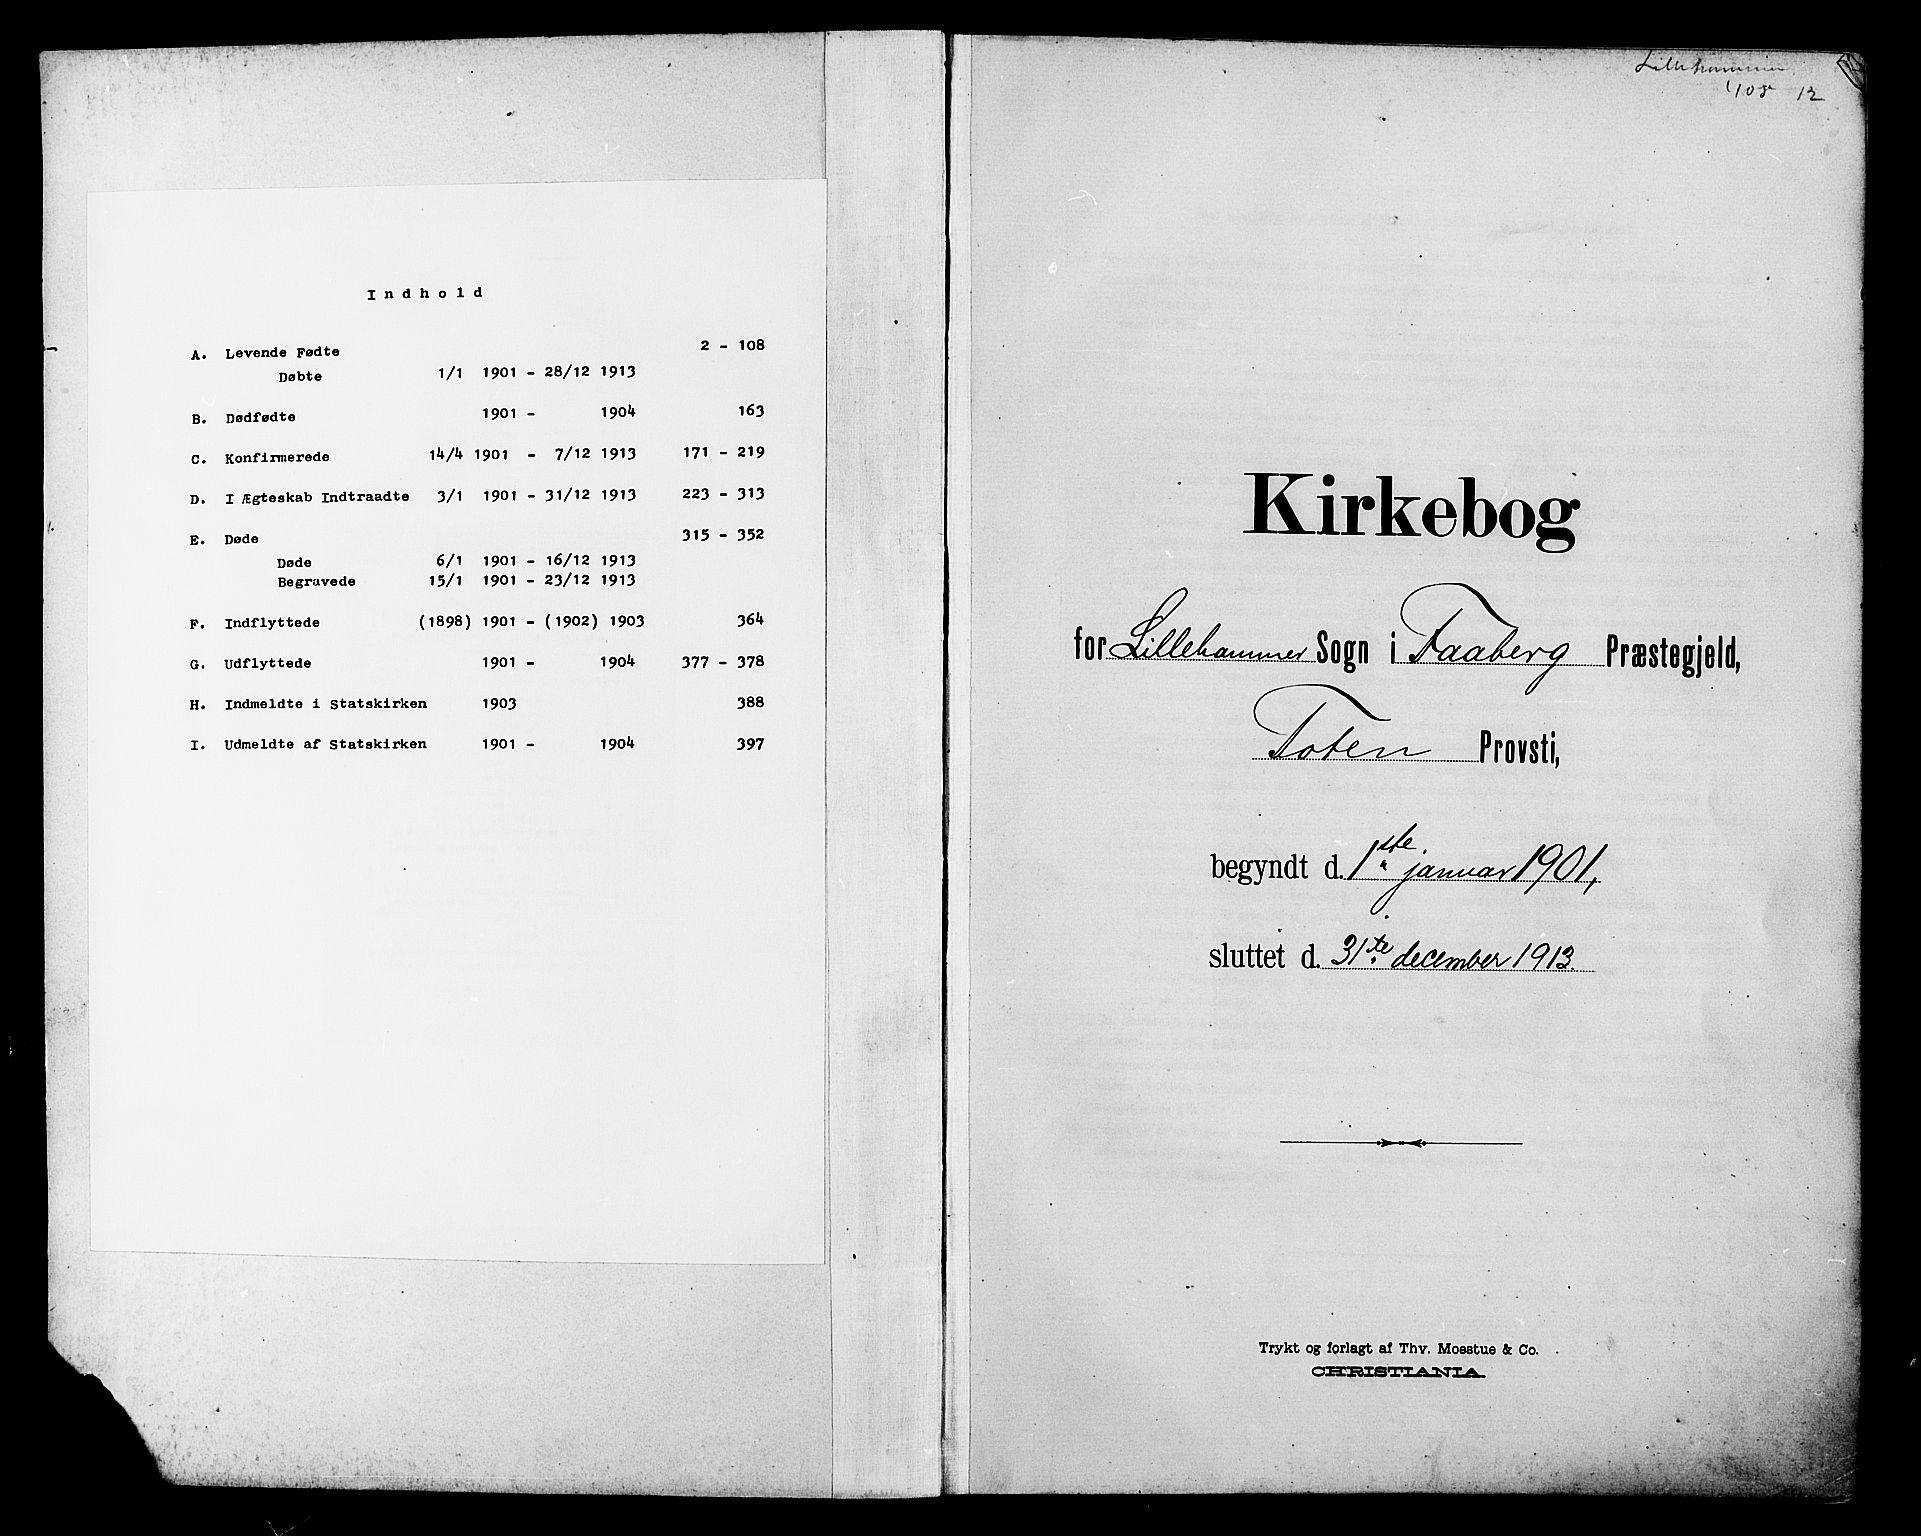 SAH, Lillehammer prestekontor, Klokkerbok nr. 1, 1901-1913